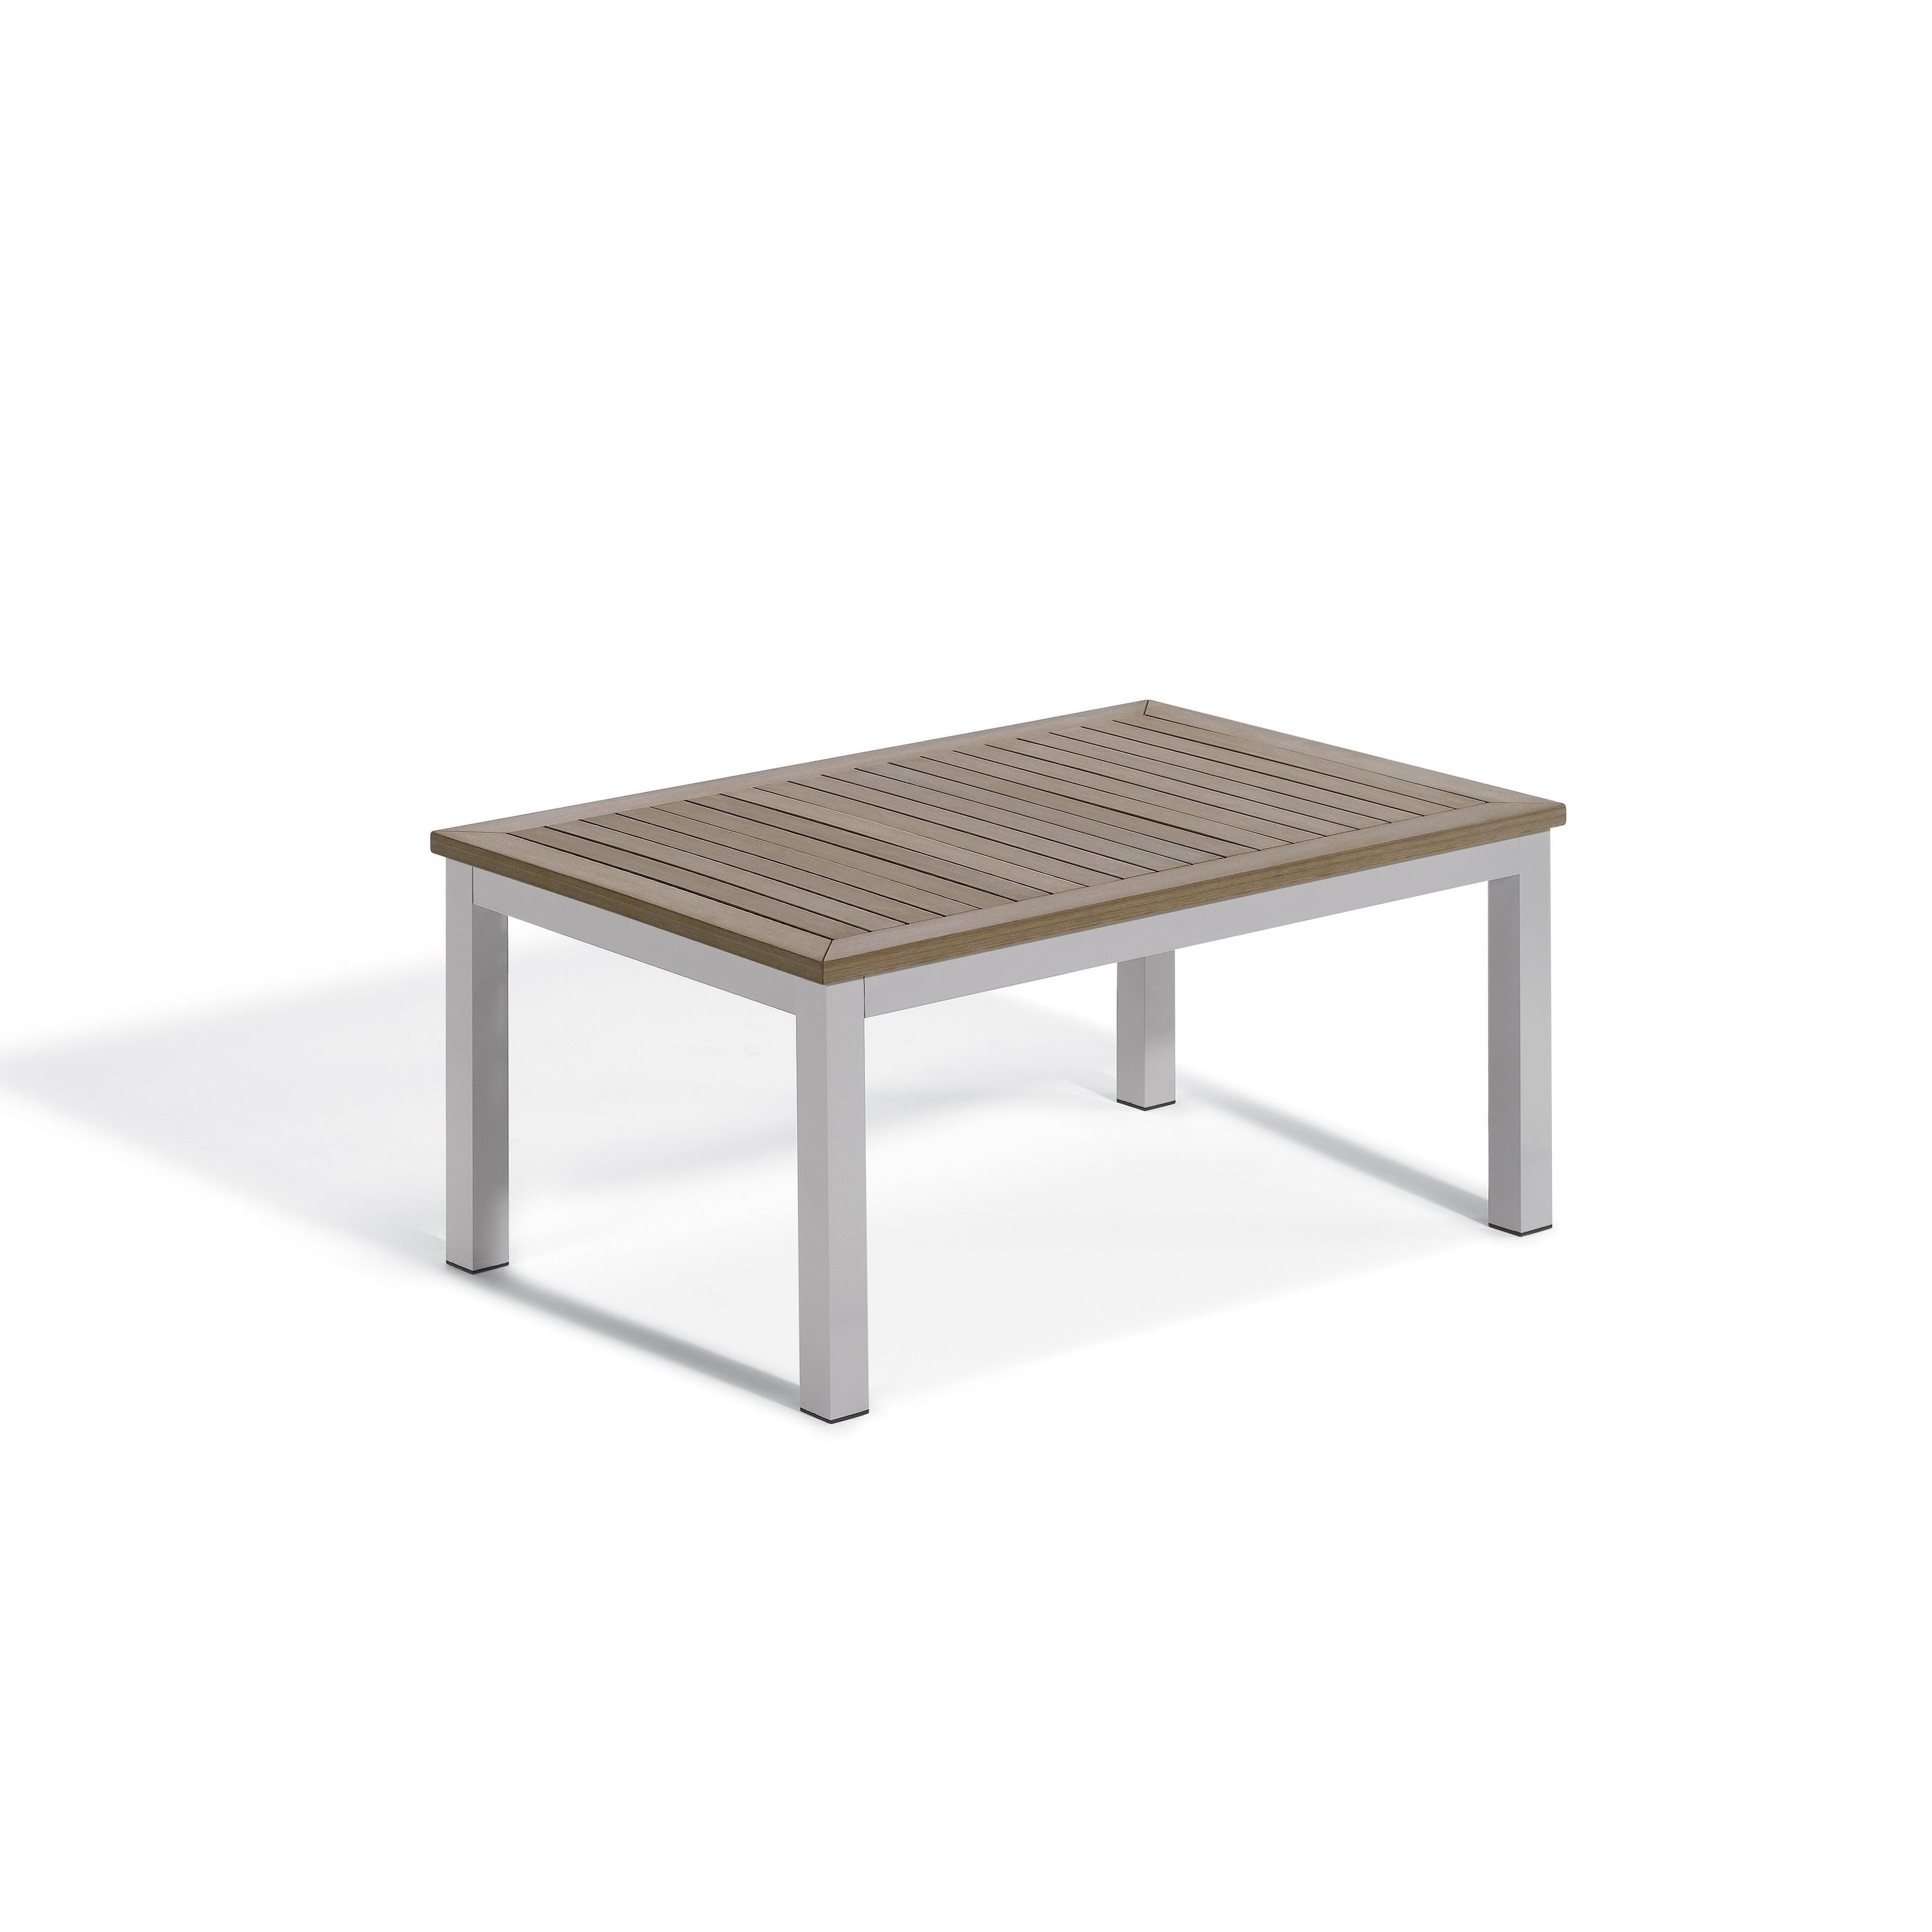 Oxford Garden Travira Coffee Table - Aluminum Frame, Vint...